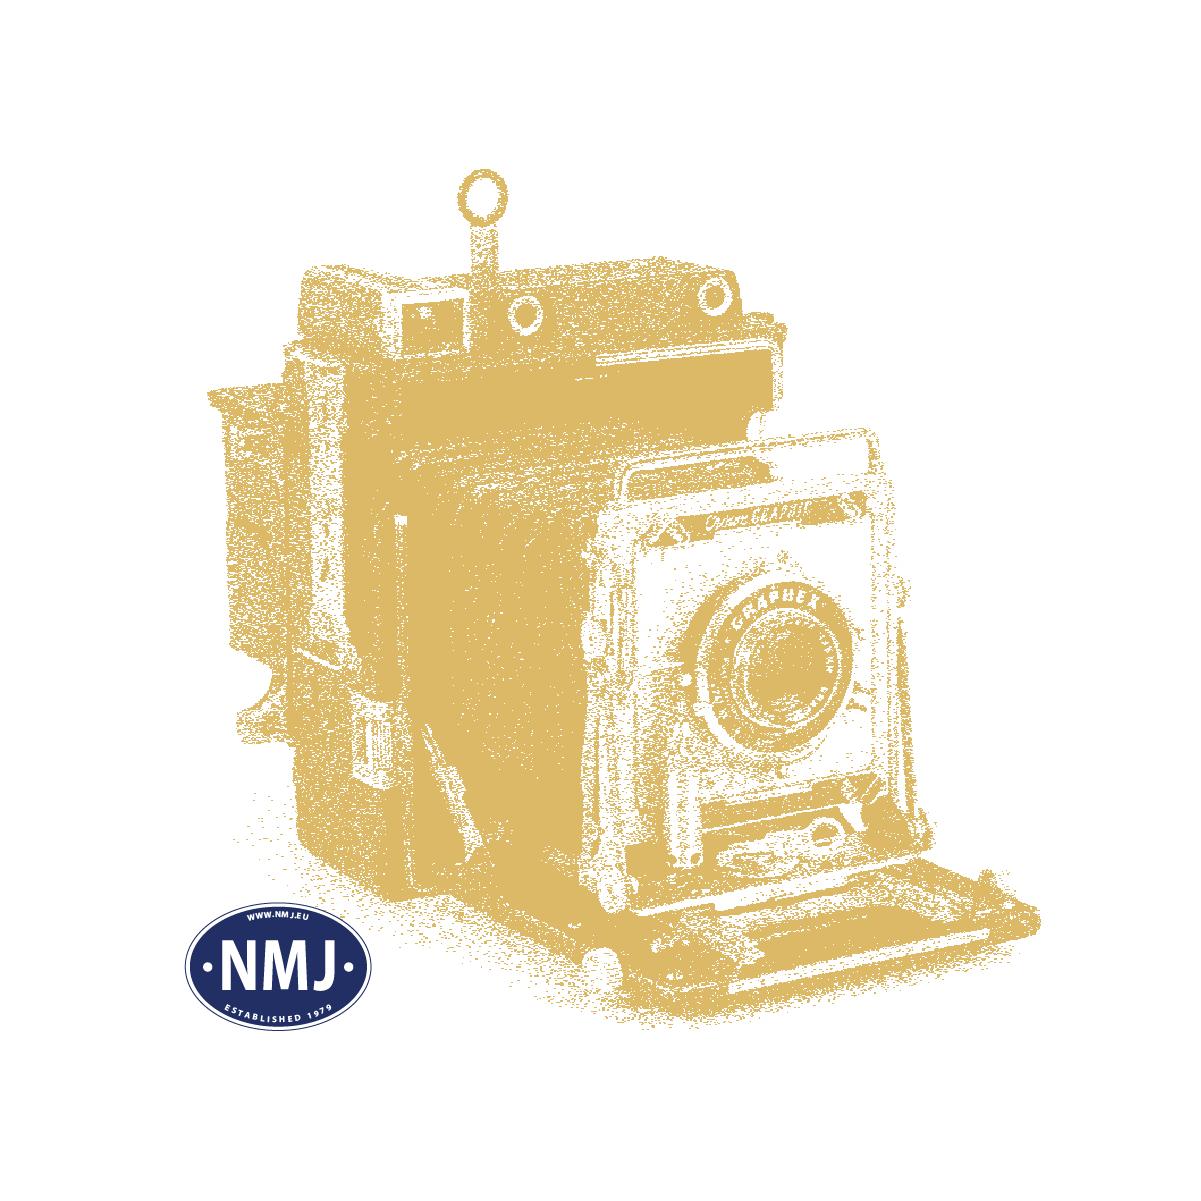 MBR51-4406 - Fichte Sommer, 30-40cm, 0/1